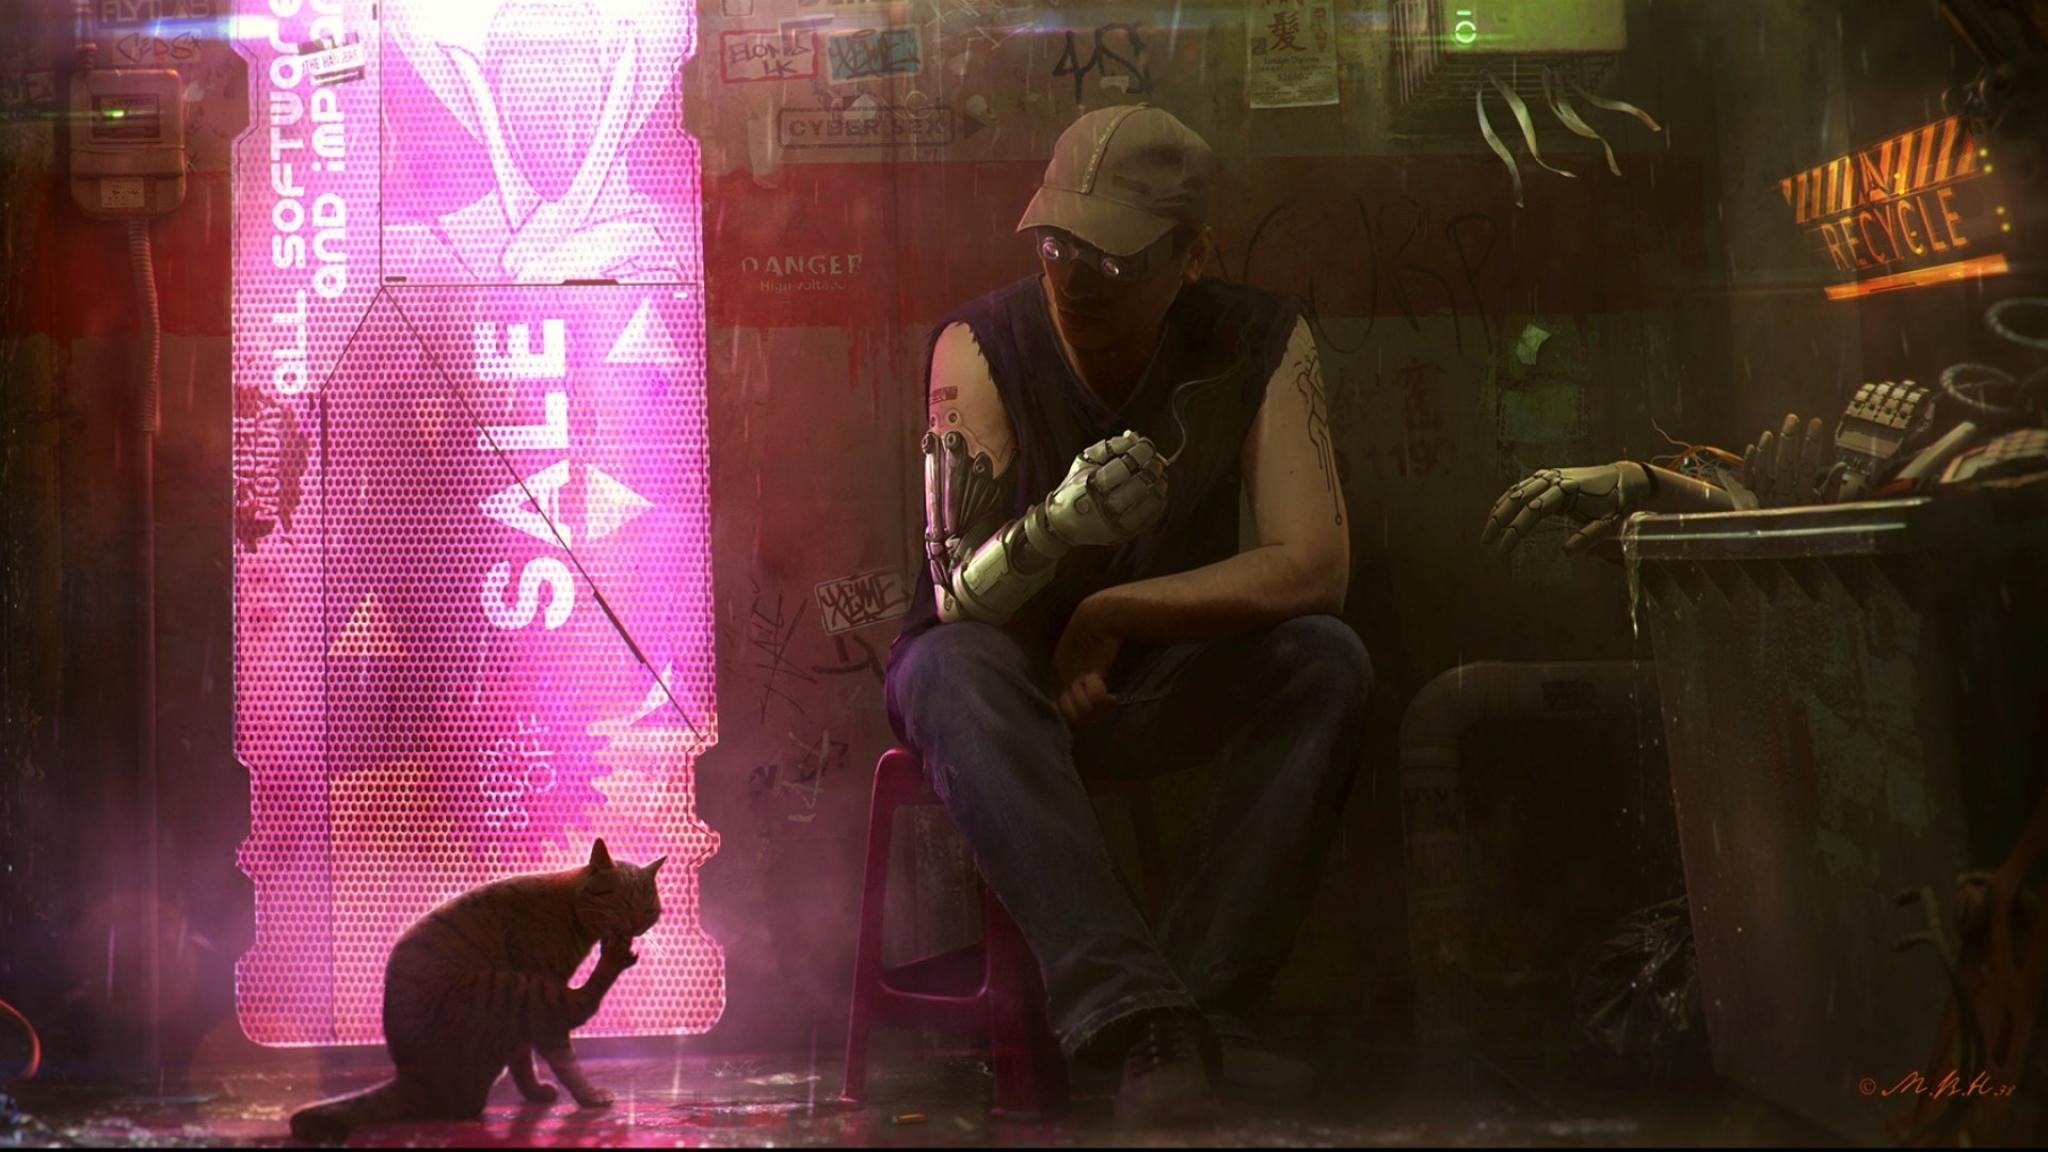 General 2048x1152 artwork fantasy art science fiction cats cyberpunk